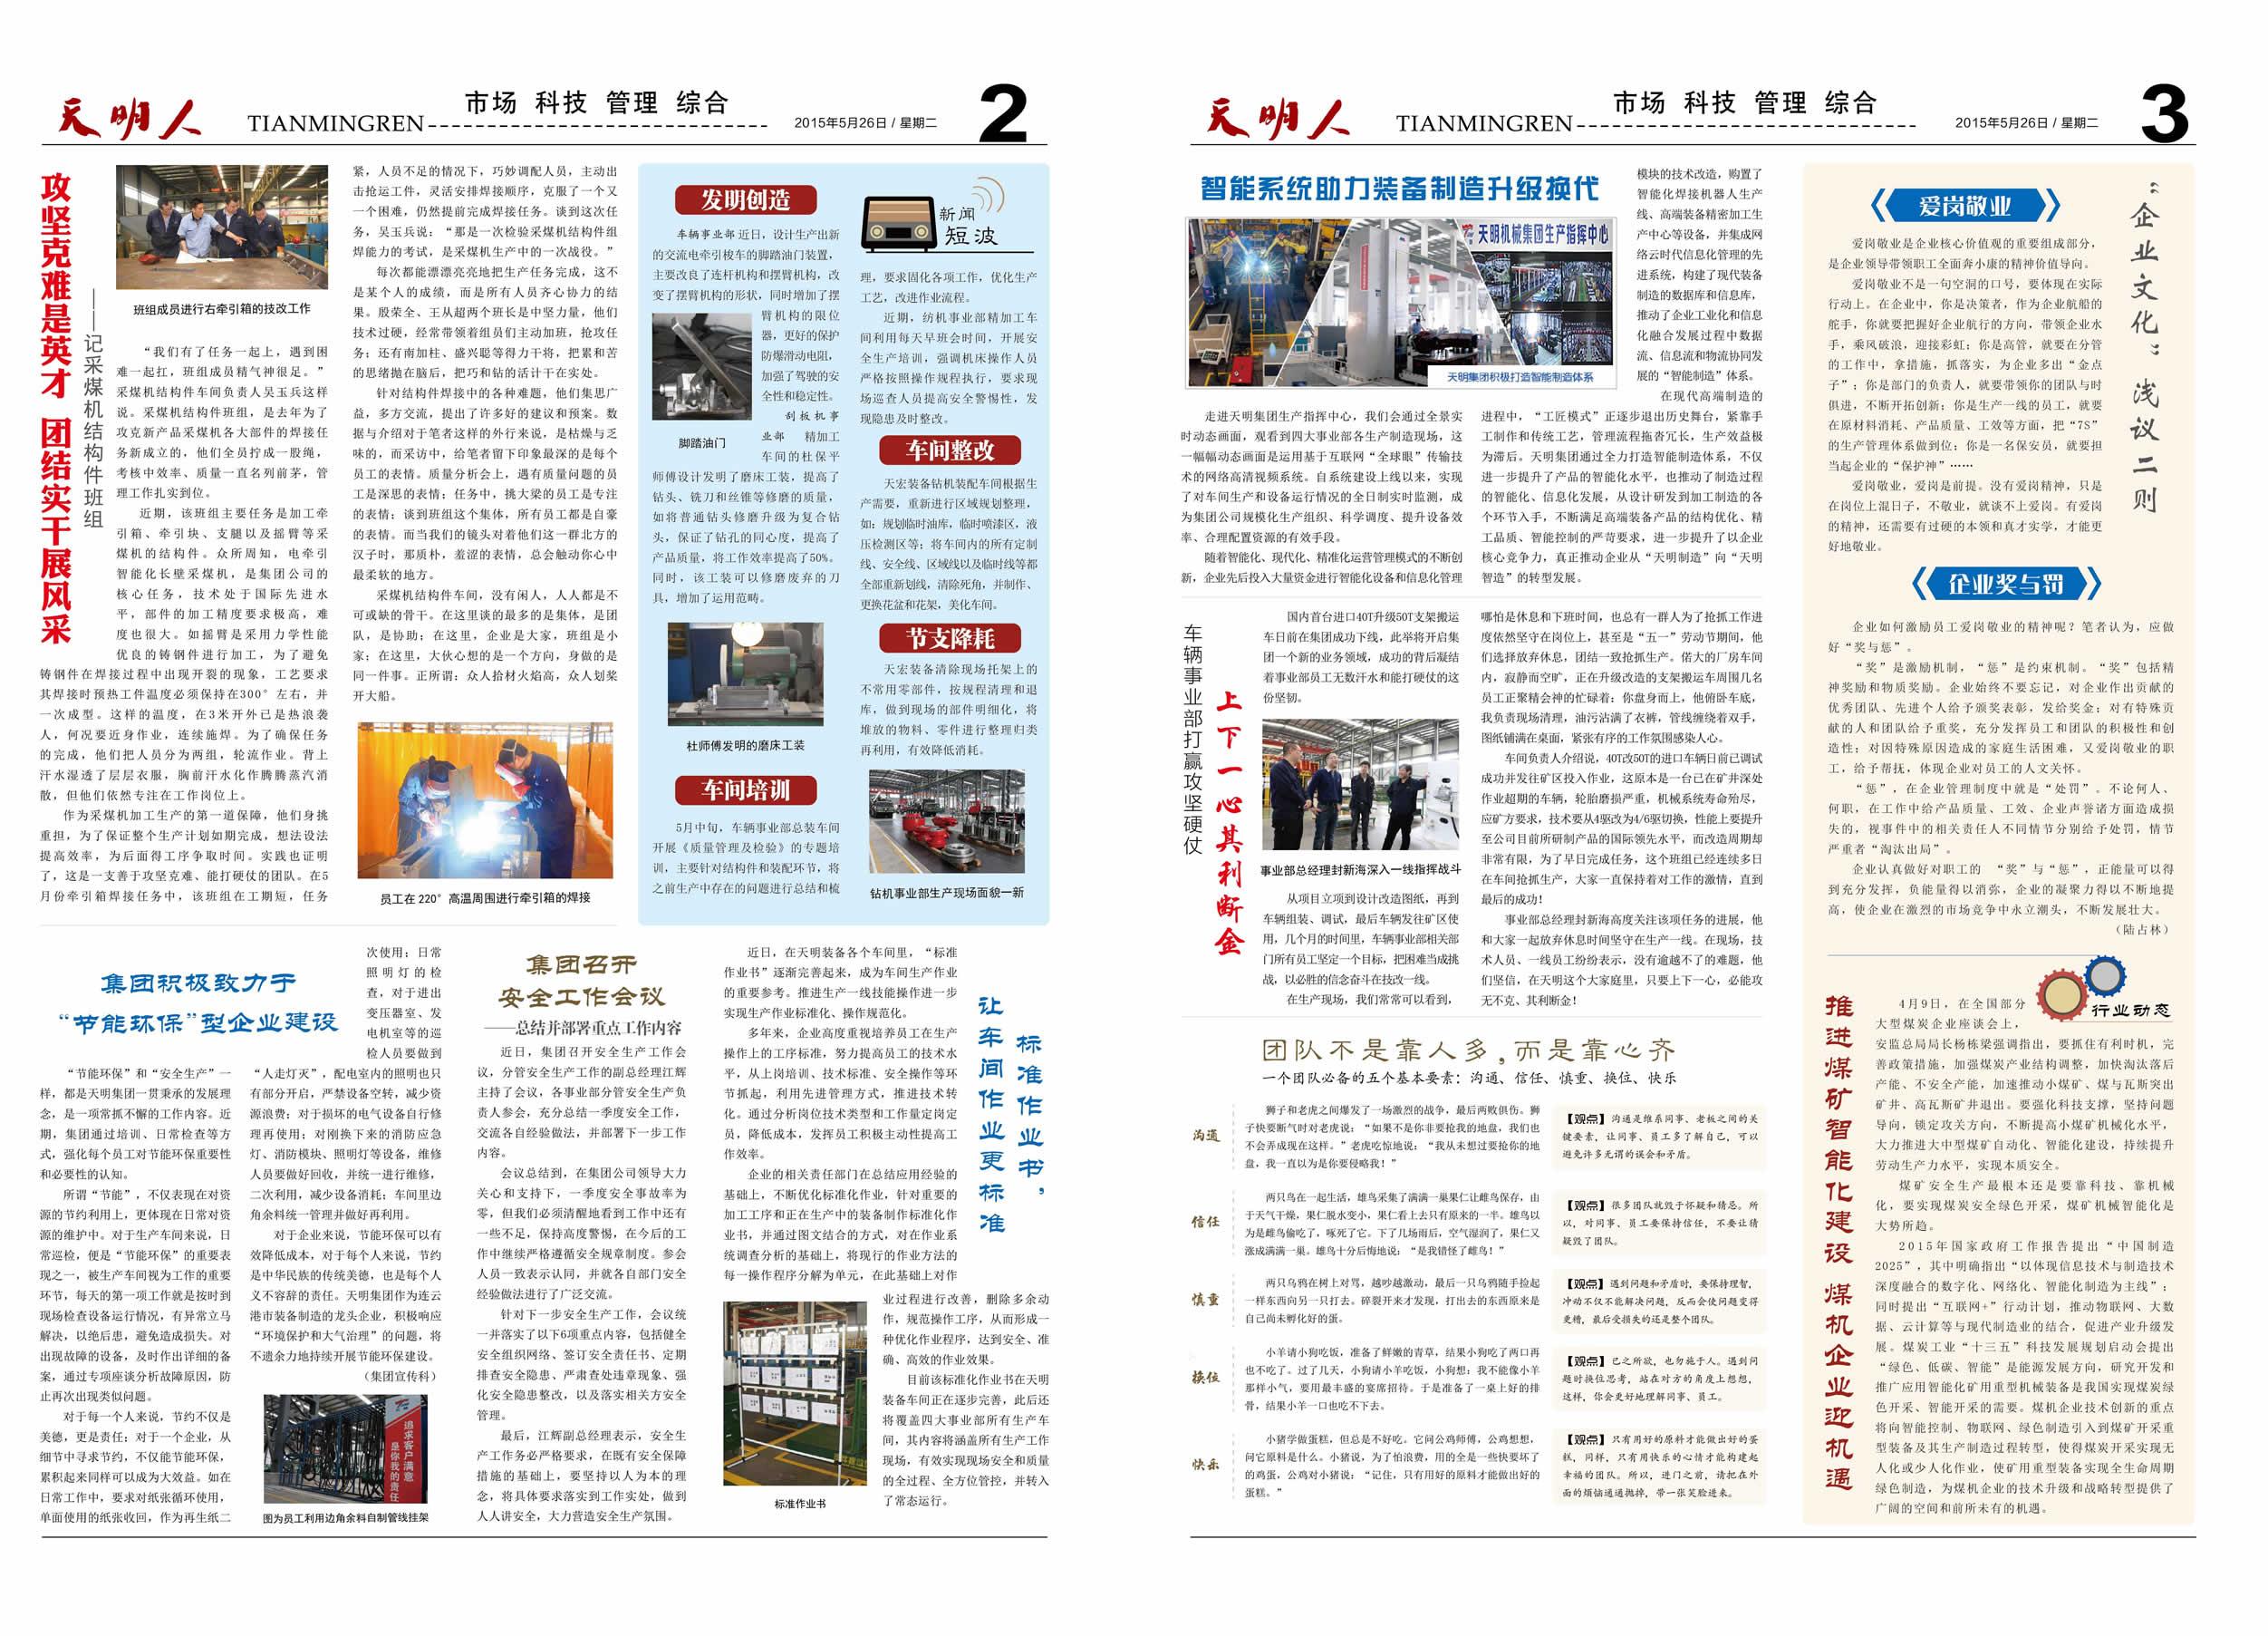 hg711皇冠国际_hg88皇冠国际平台_hg皇冠国际vip首页人2015第05期(总第91期)2、3版